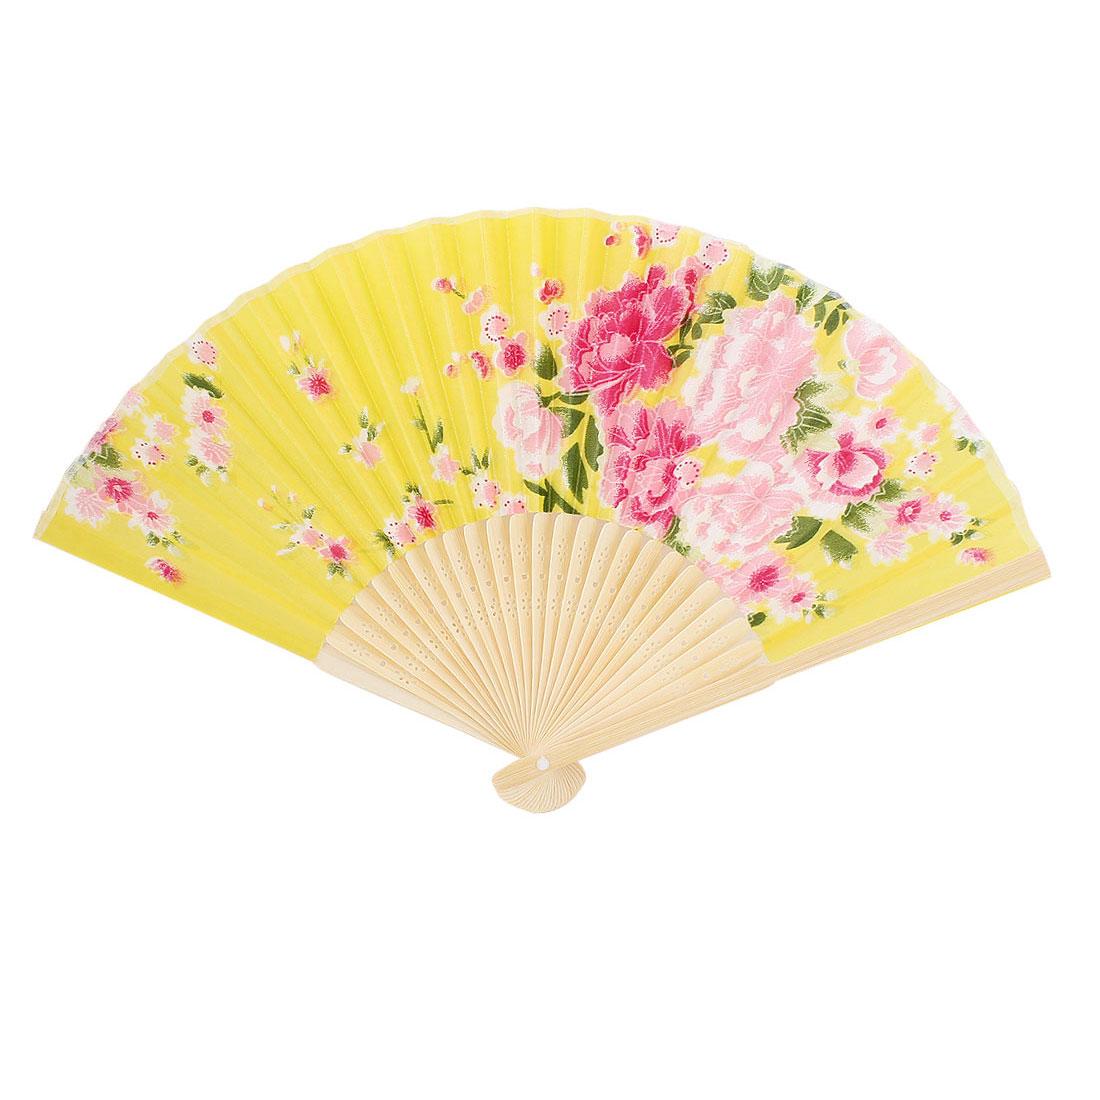 "Women Performance Dancing Pink Blooming Flower Pattern Yellow Nylon Folding Hand Fan 37cm 15"""